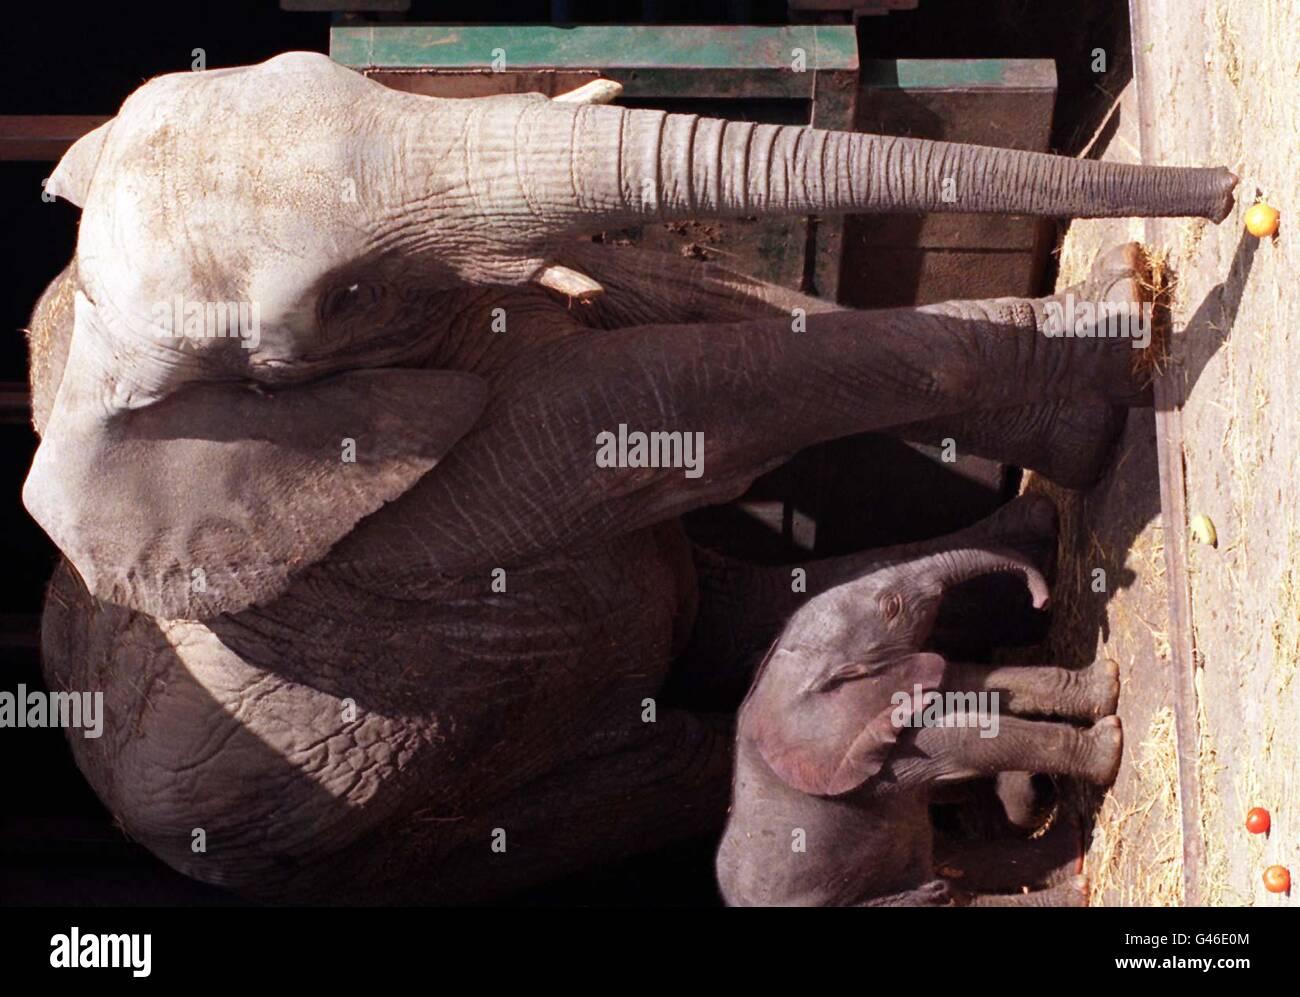 Jumar the elephant & calf - Stock Image